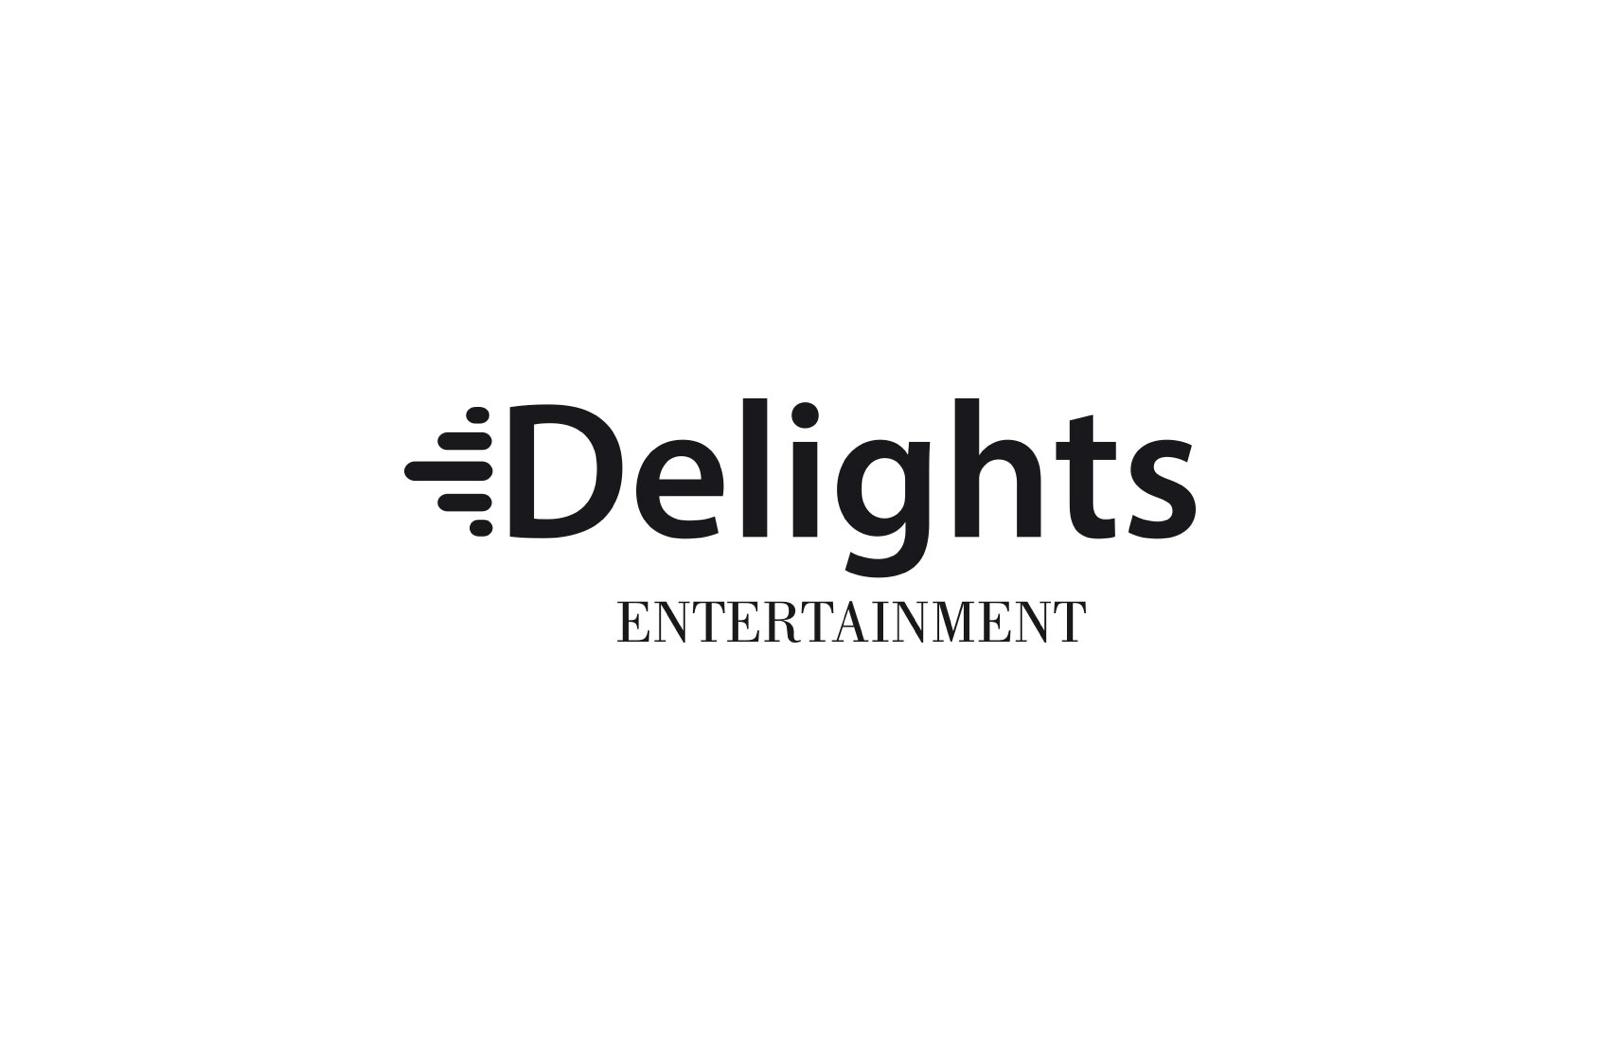 delights